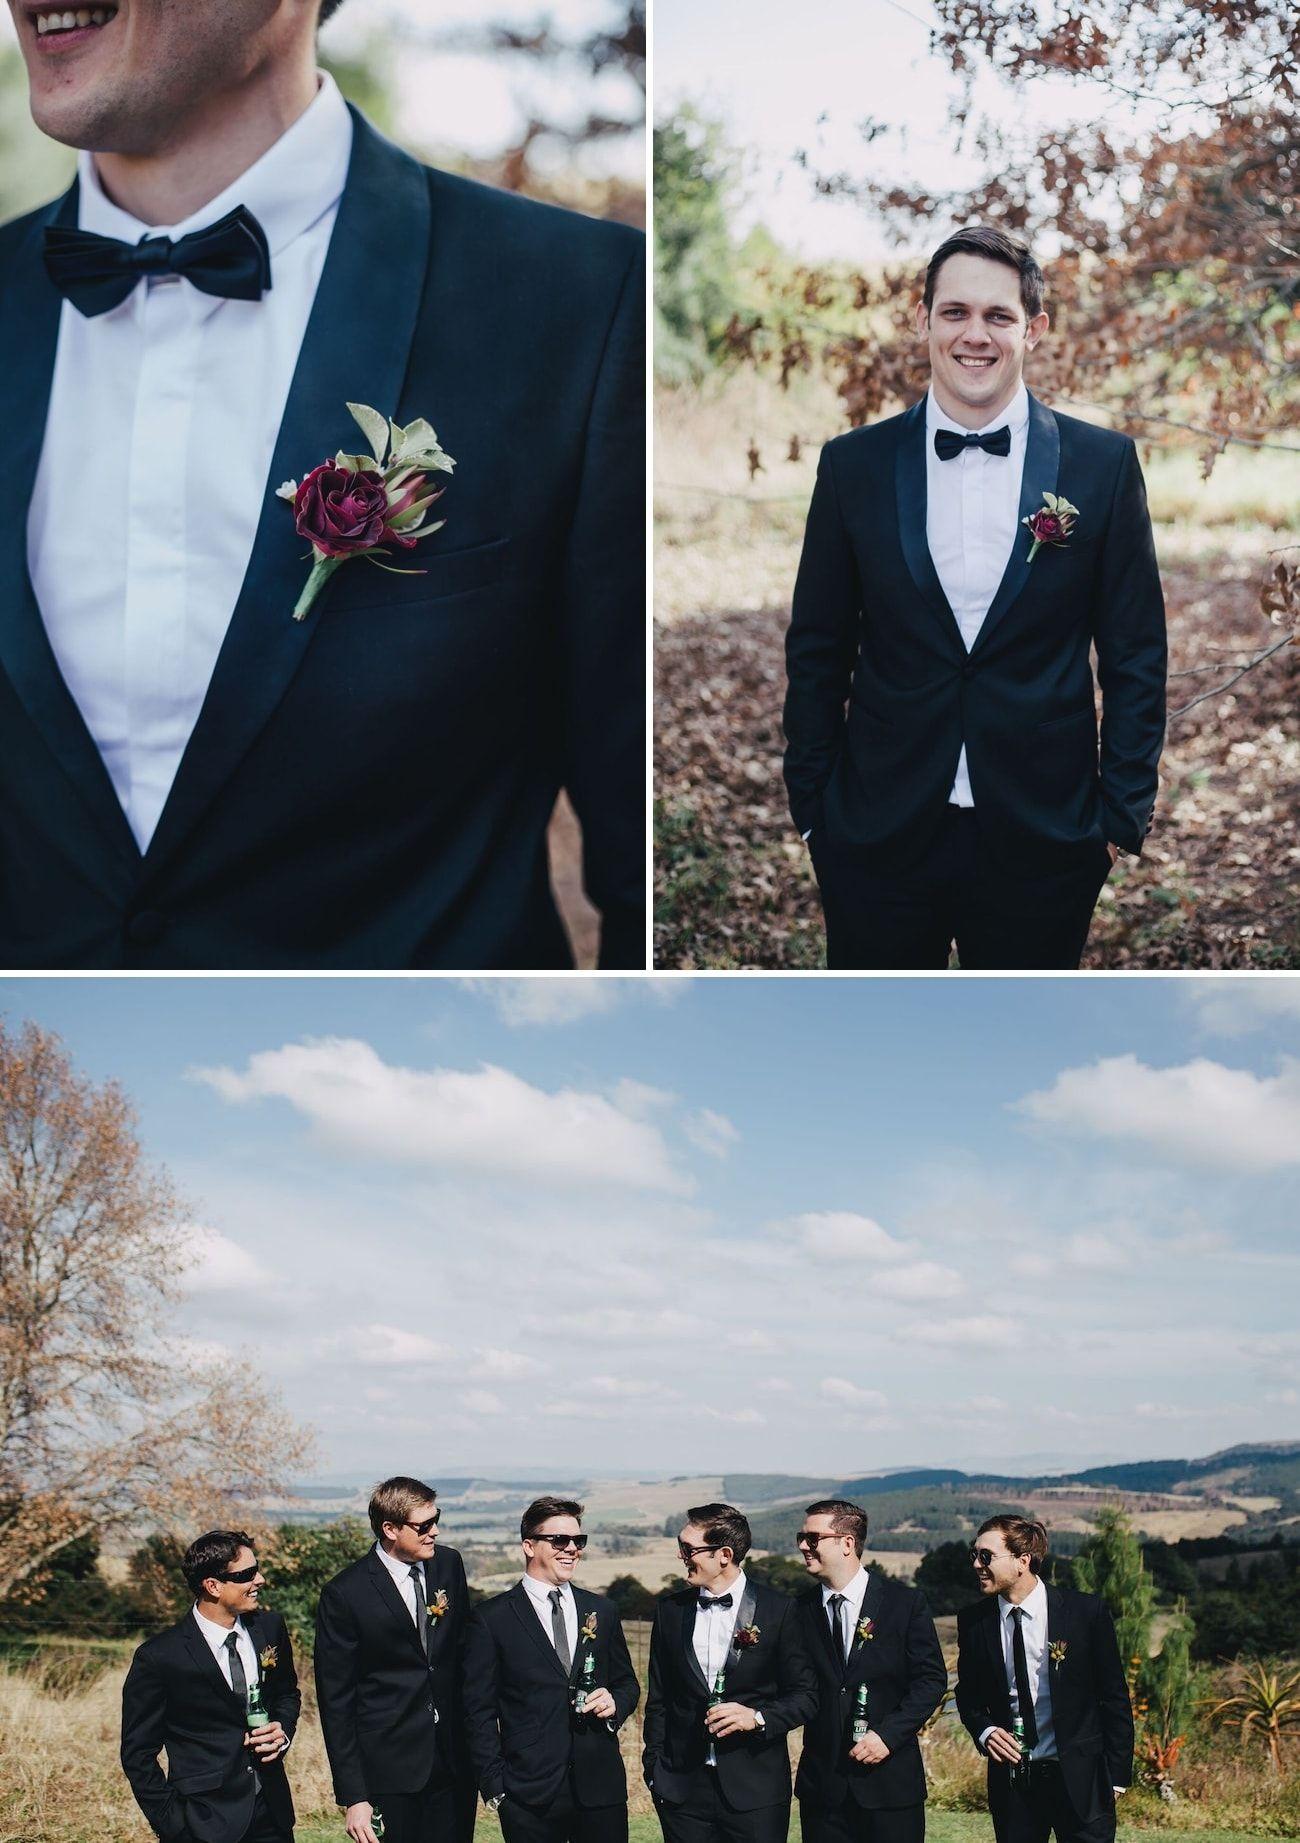 Scandinavian Gothic Wedding by Vanilla Photography | Gothic wedding ...